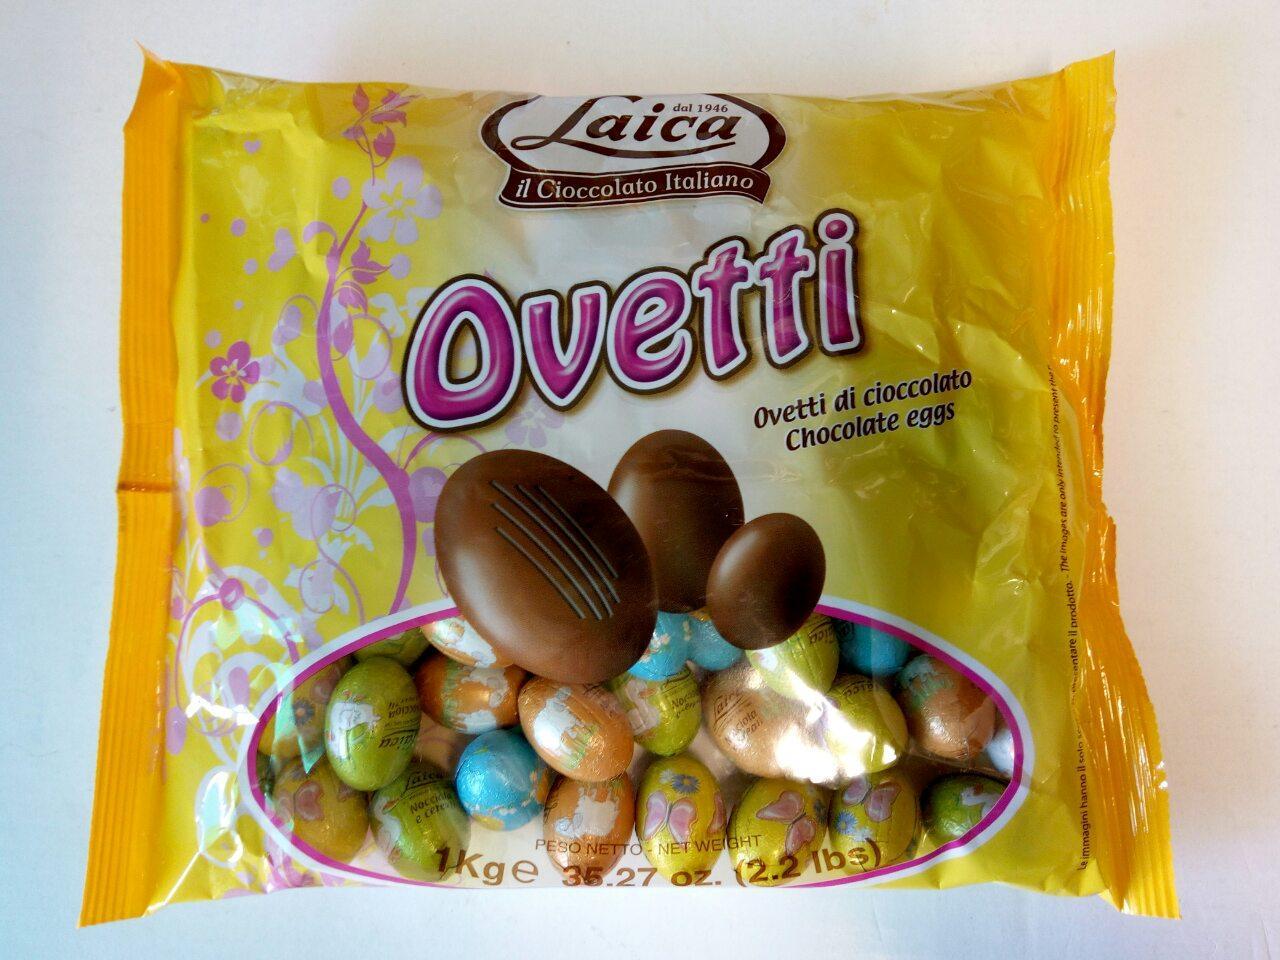 Шоколадные яйца с пралине ассорти Laica Ovetti 1 кг. Италия